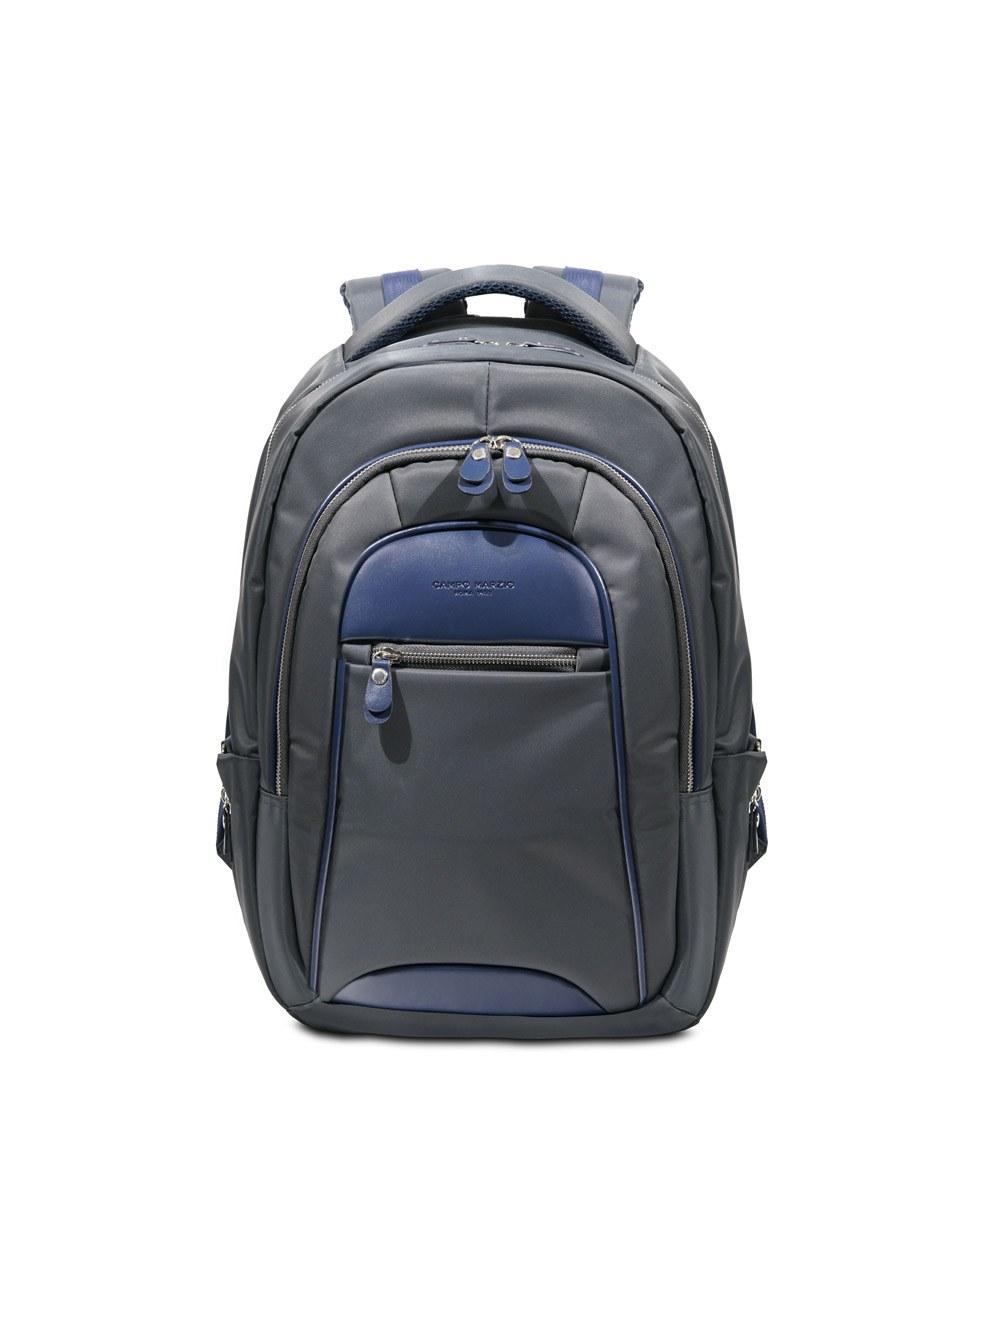 Backpack Maxi Livingstone - Grey